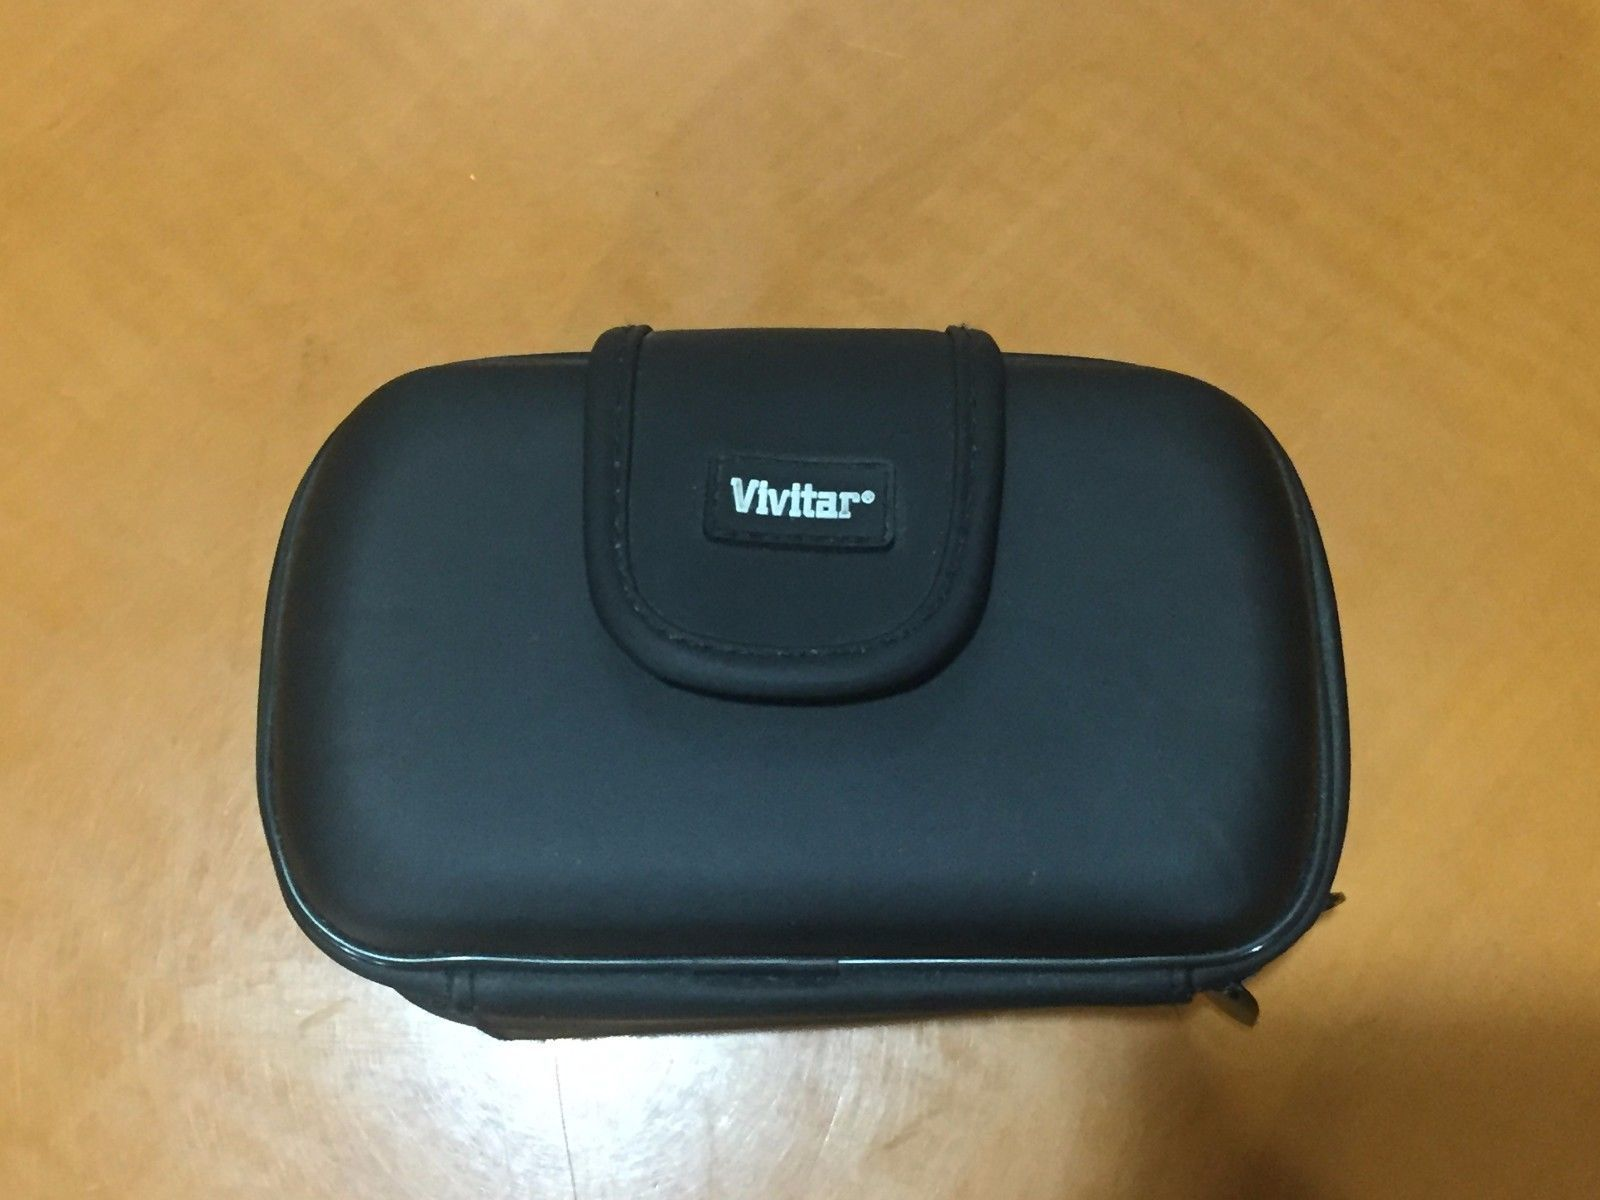 "Vivitar Black Hard Shell Camcorder Video Camera Case Bag 5.4x2.8x3.2"" - $5.93"